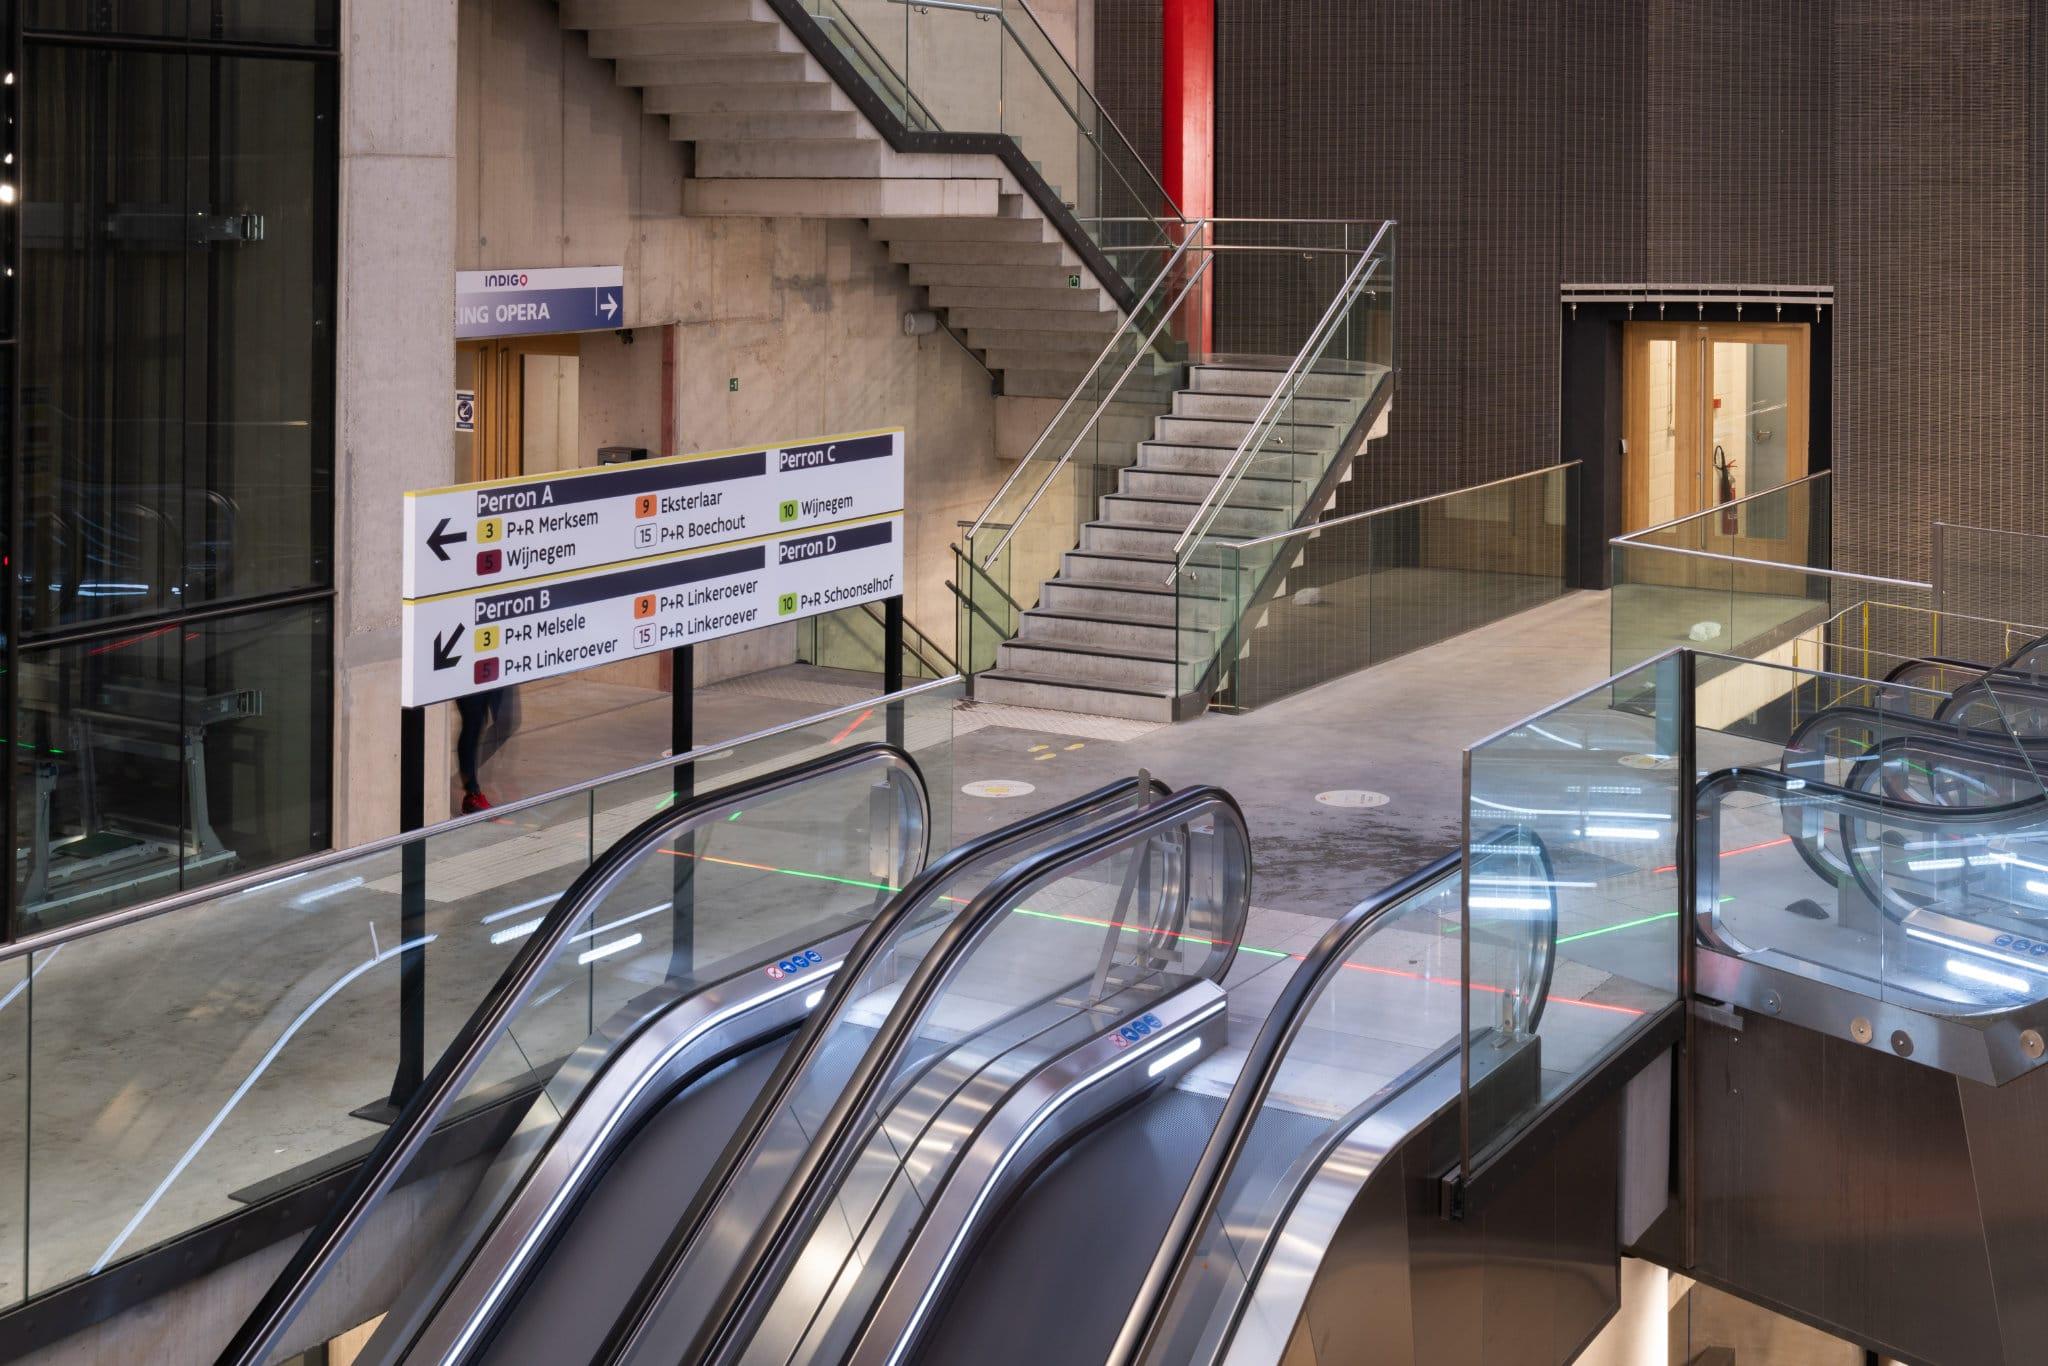 Sign & Display - Binnensignalisatie - Metro Station Opera